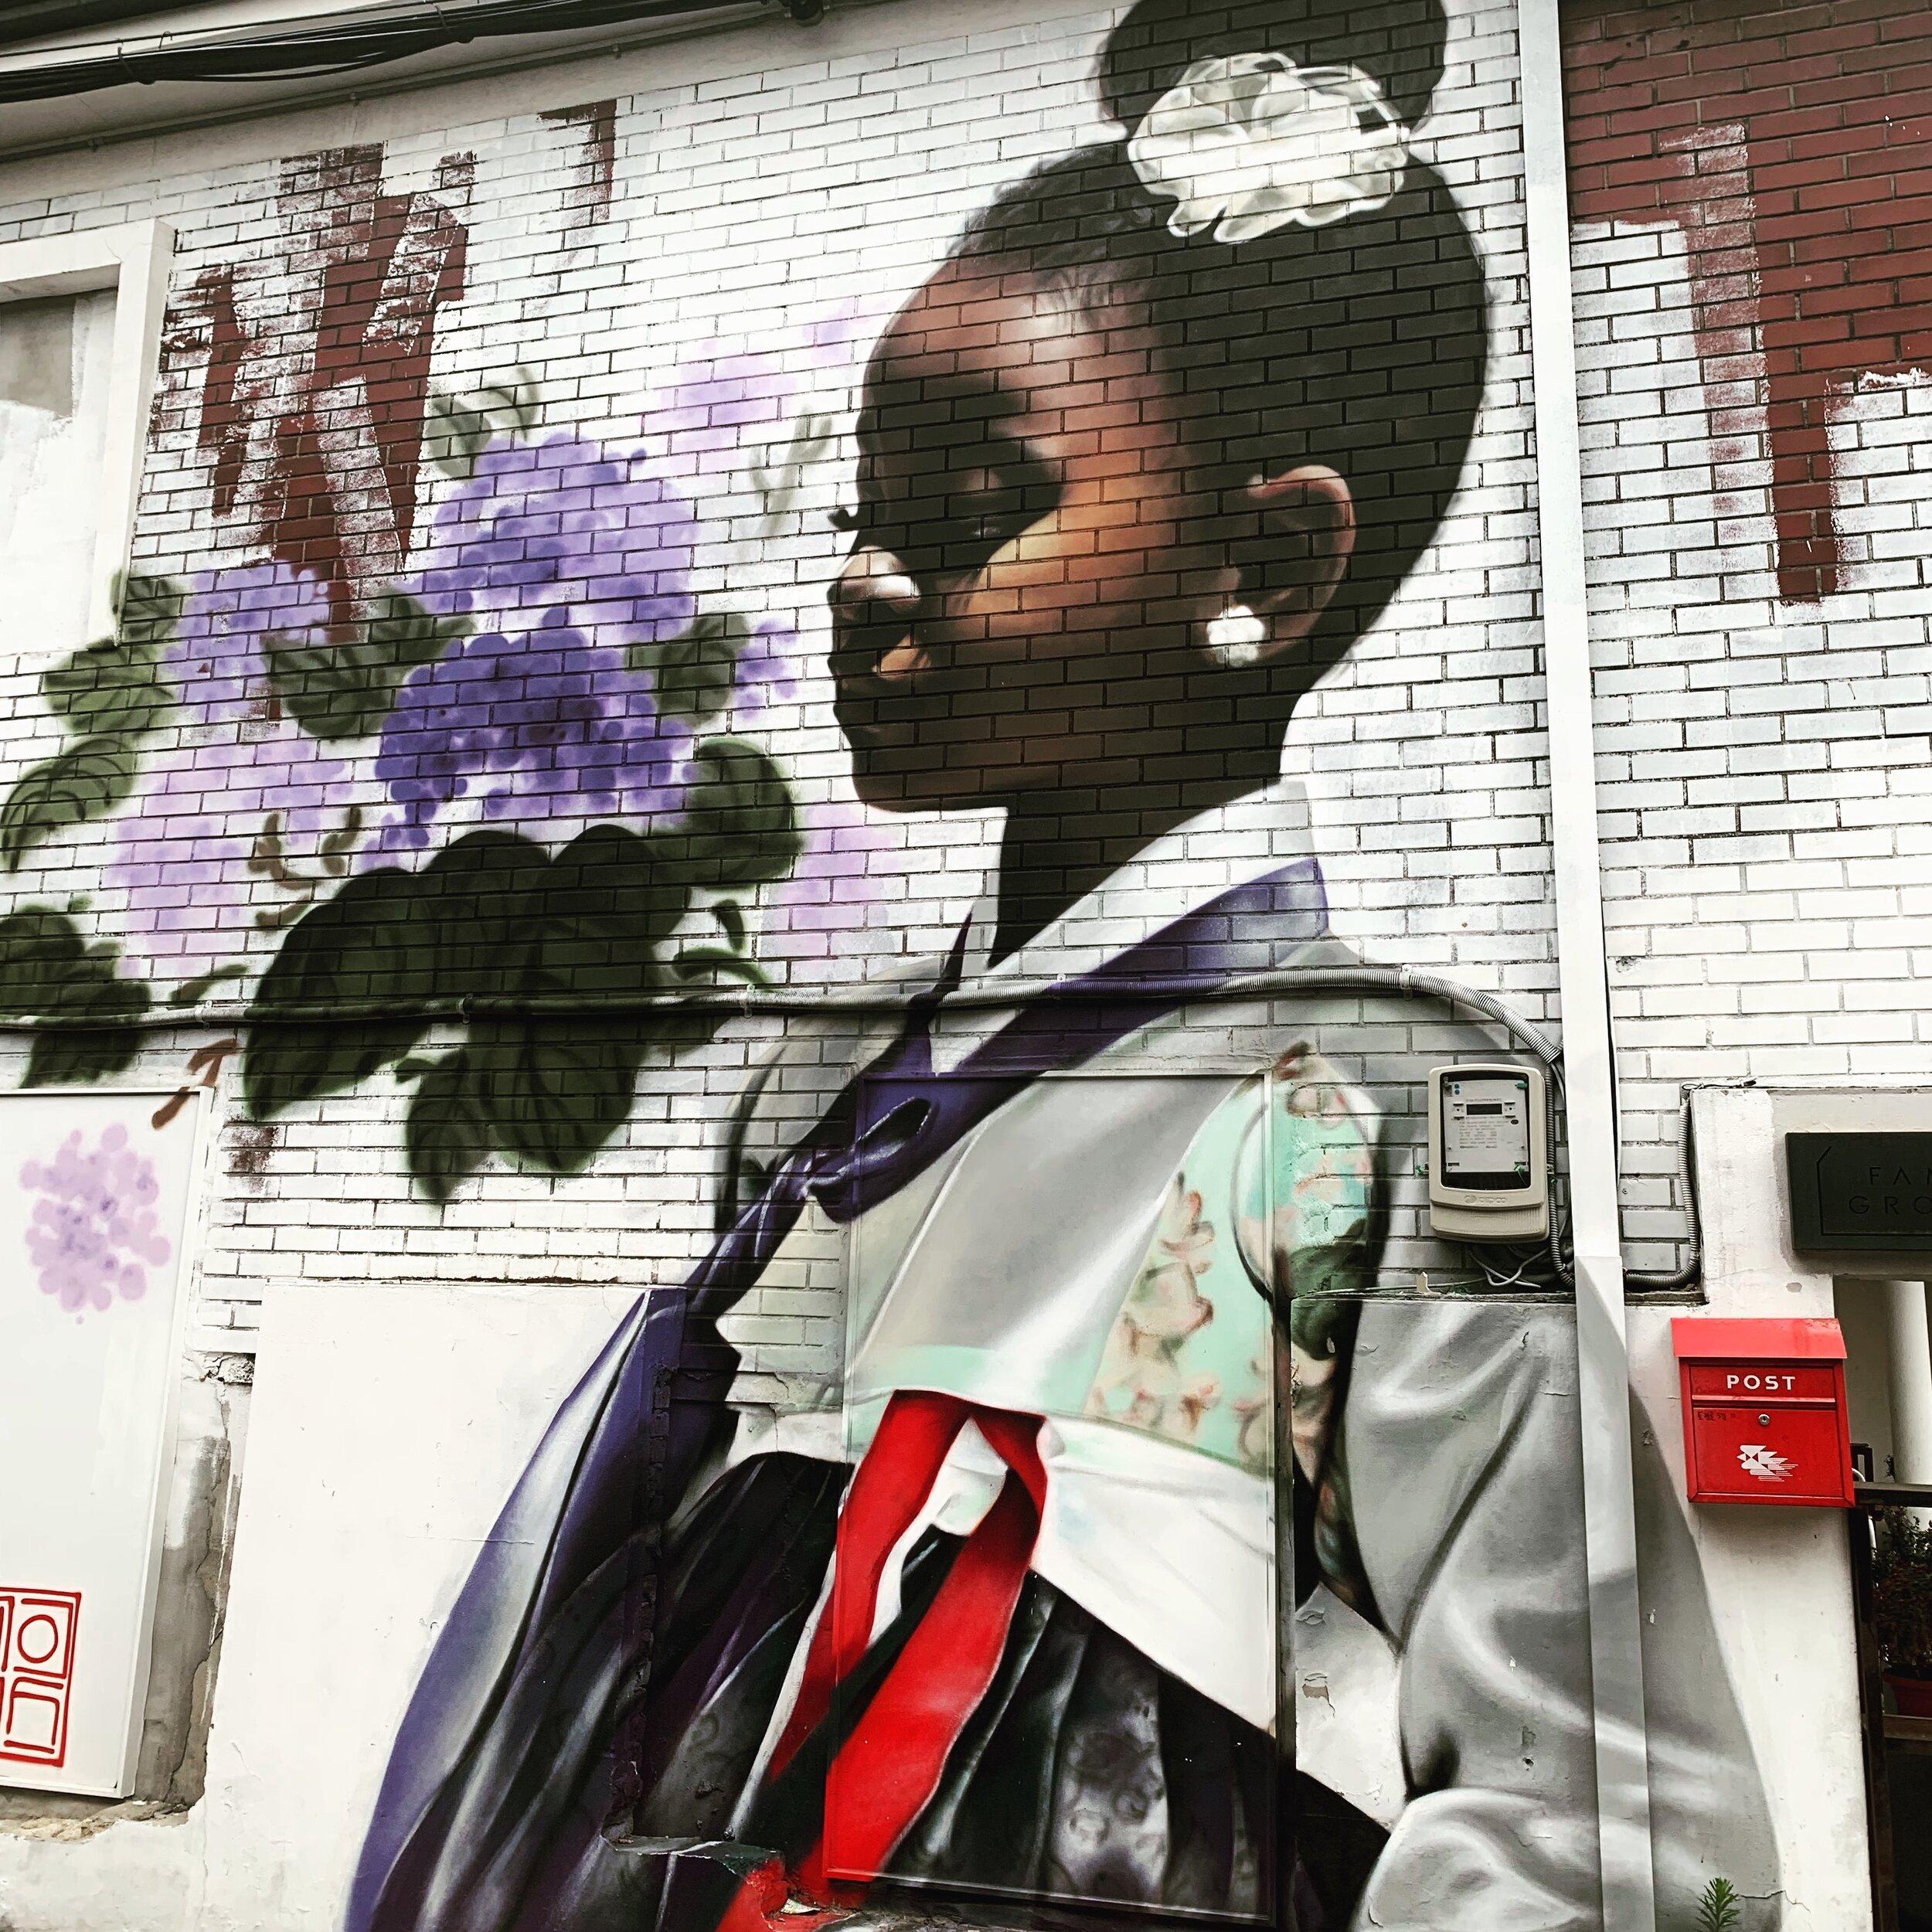 Mural by Chris Chan Shim (심찬양  @royyaldog ) taken in Hapjeong-dong, Seoul, South Korea. (D. Draudt, July 2019).